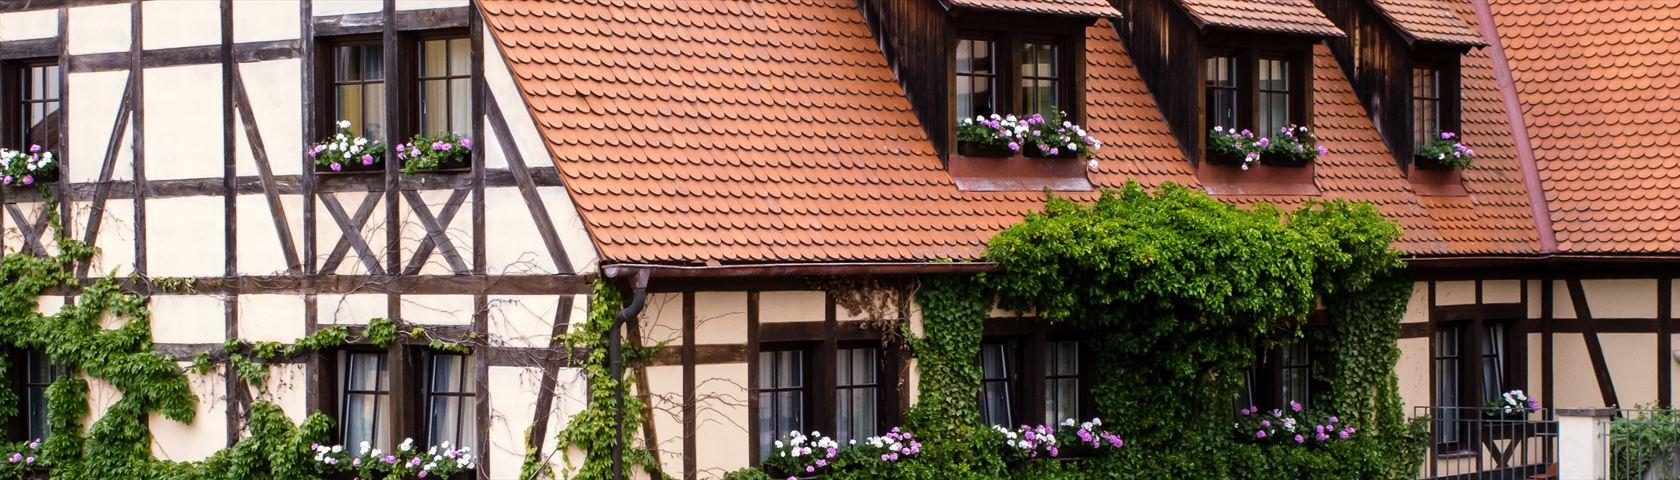 German House